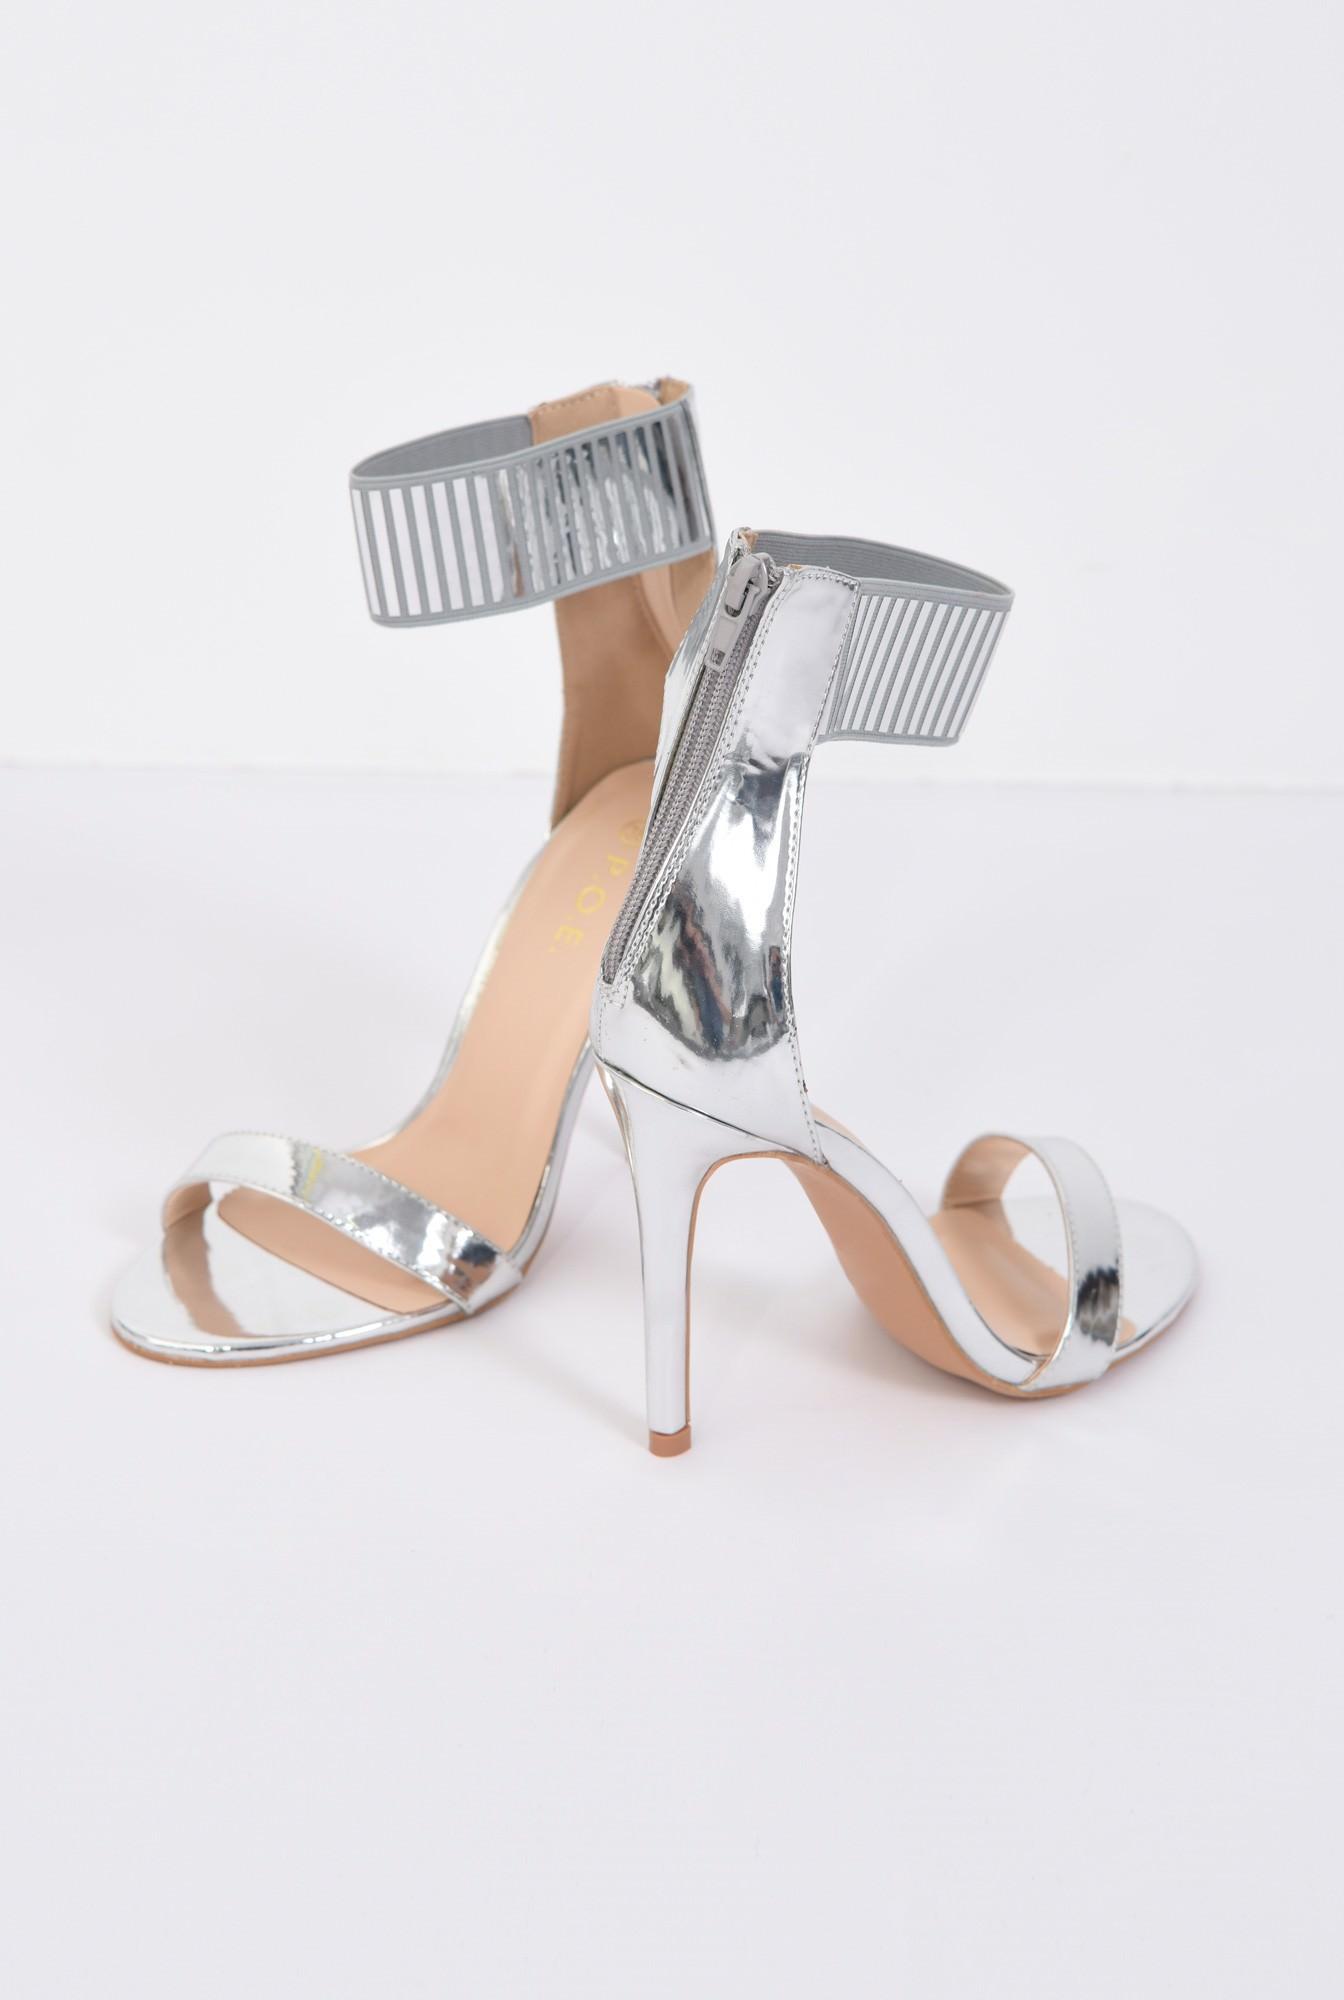 2 - sandale elegante, argintii, metalizate, stiletto